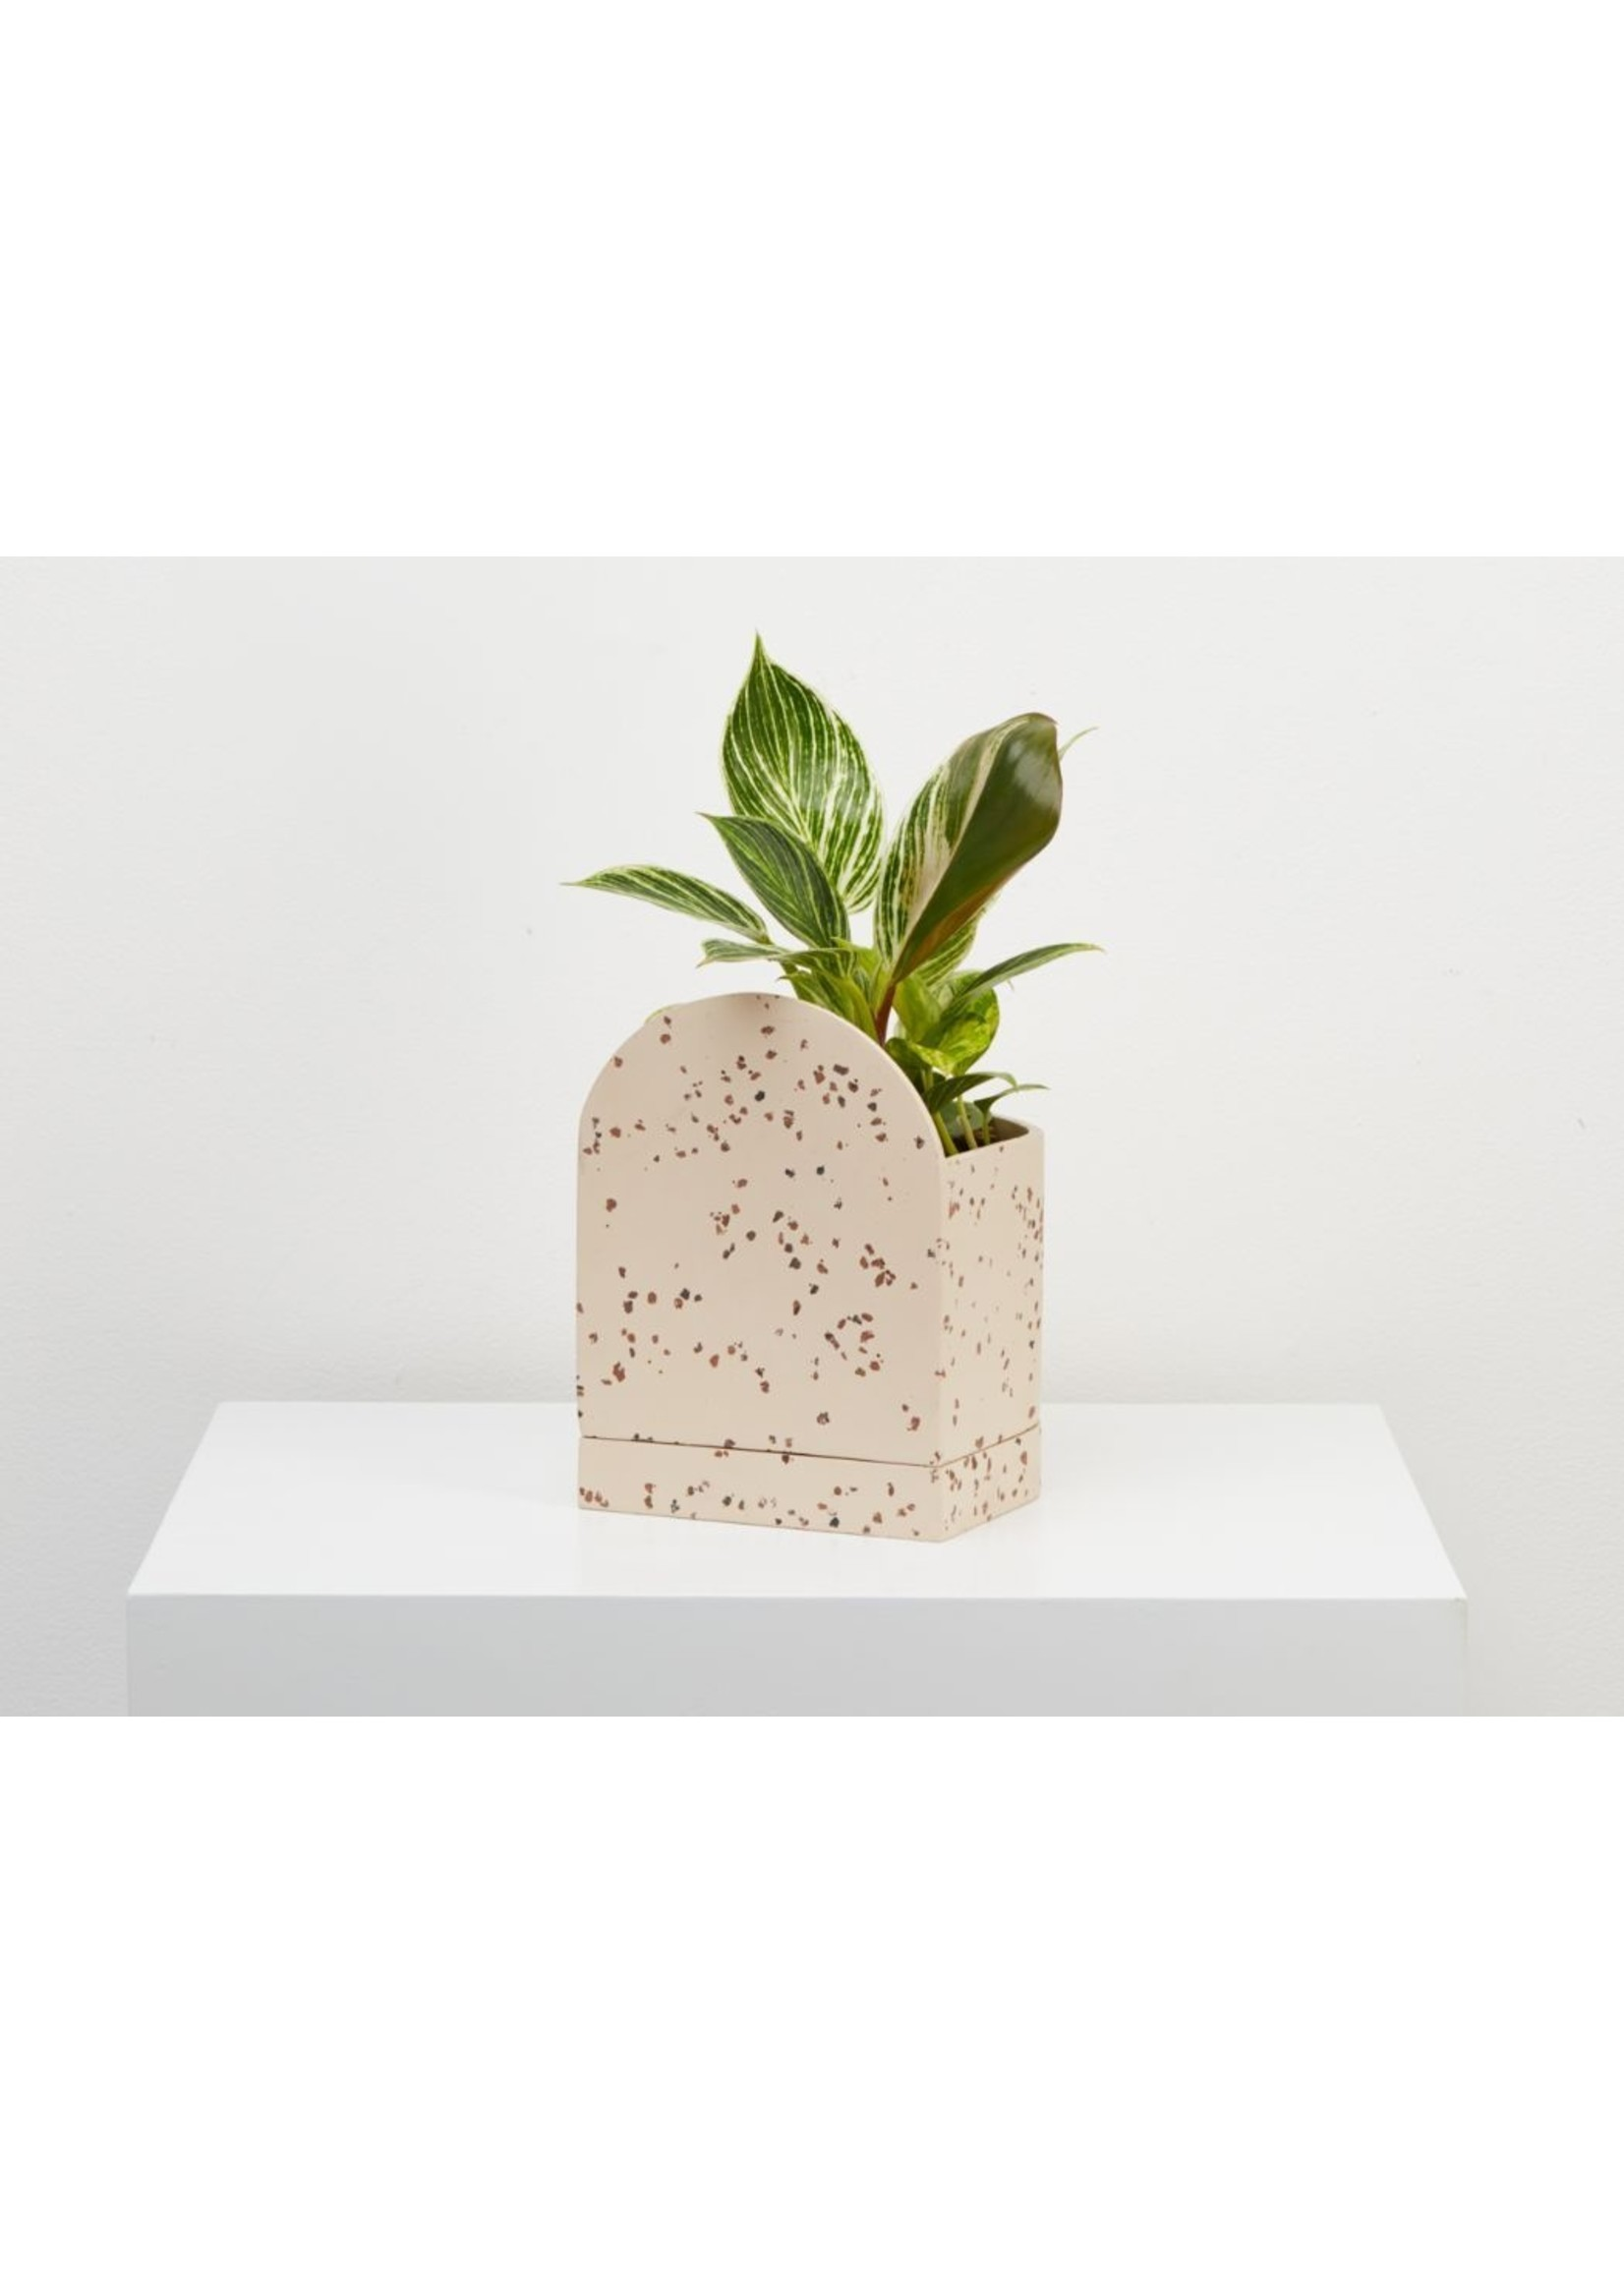 Capra Designs Capra Designs Sol Planter Terrazzo Fossil/Cream